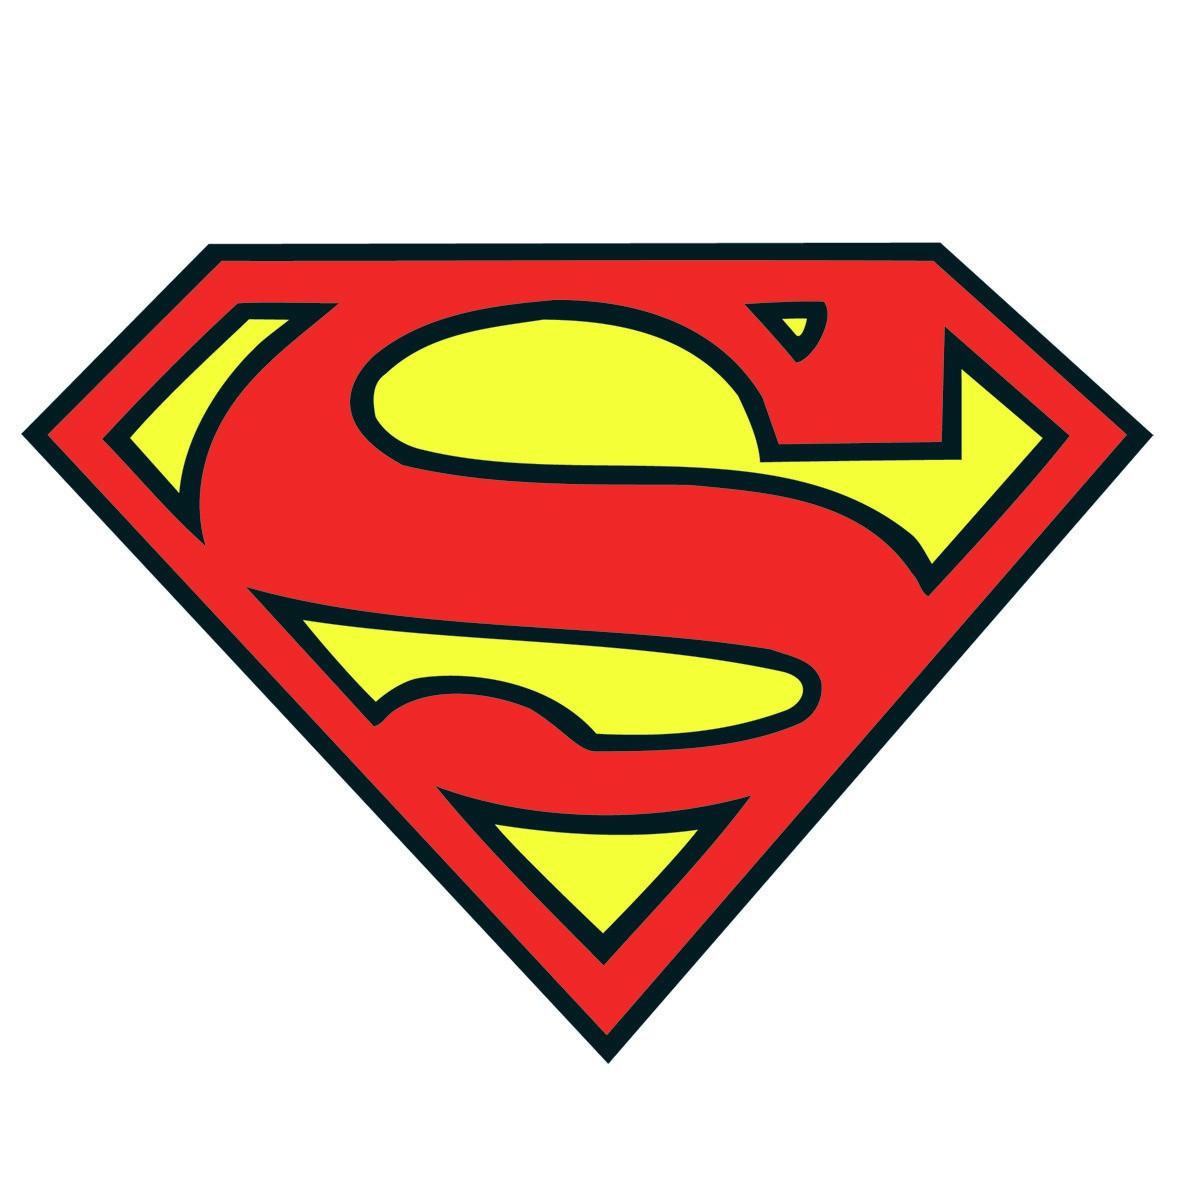 1181x1181 Superman Logo Clip Art Without The S 8 X 11 Clipart Panda